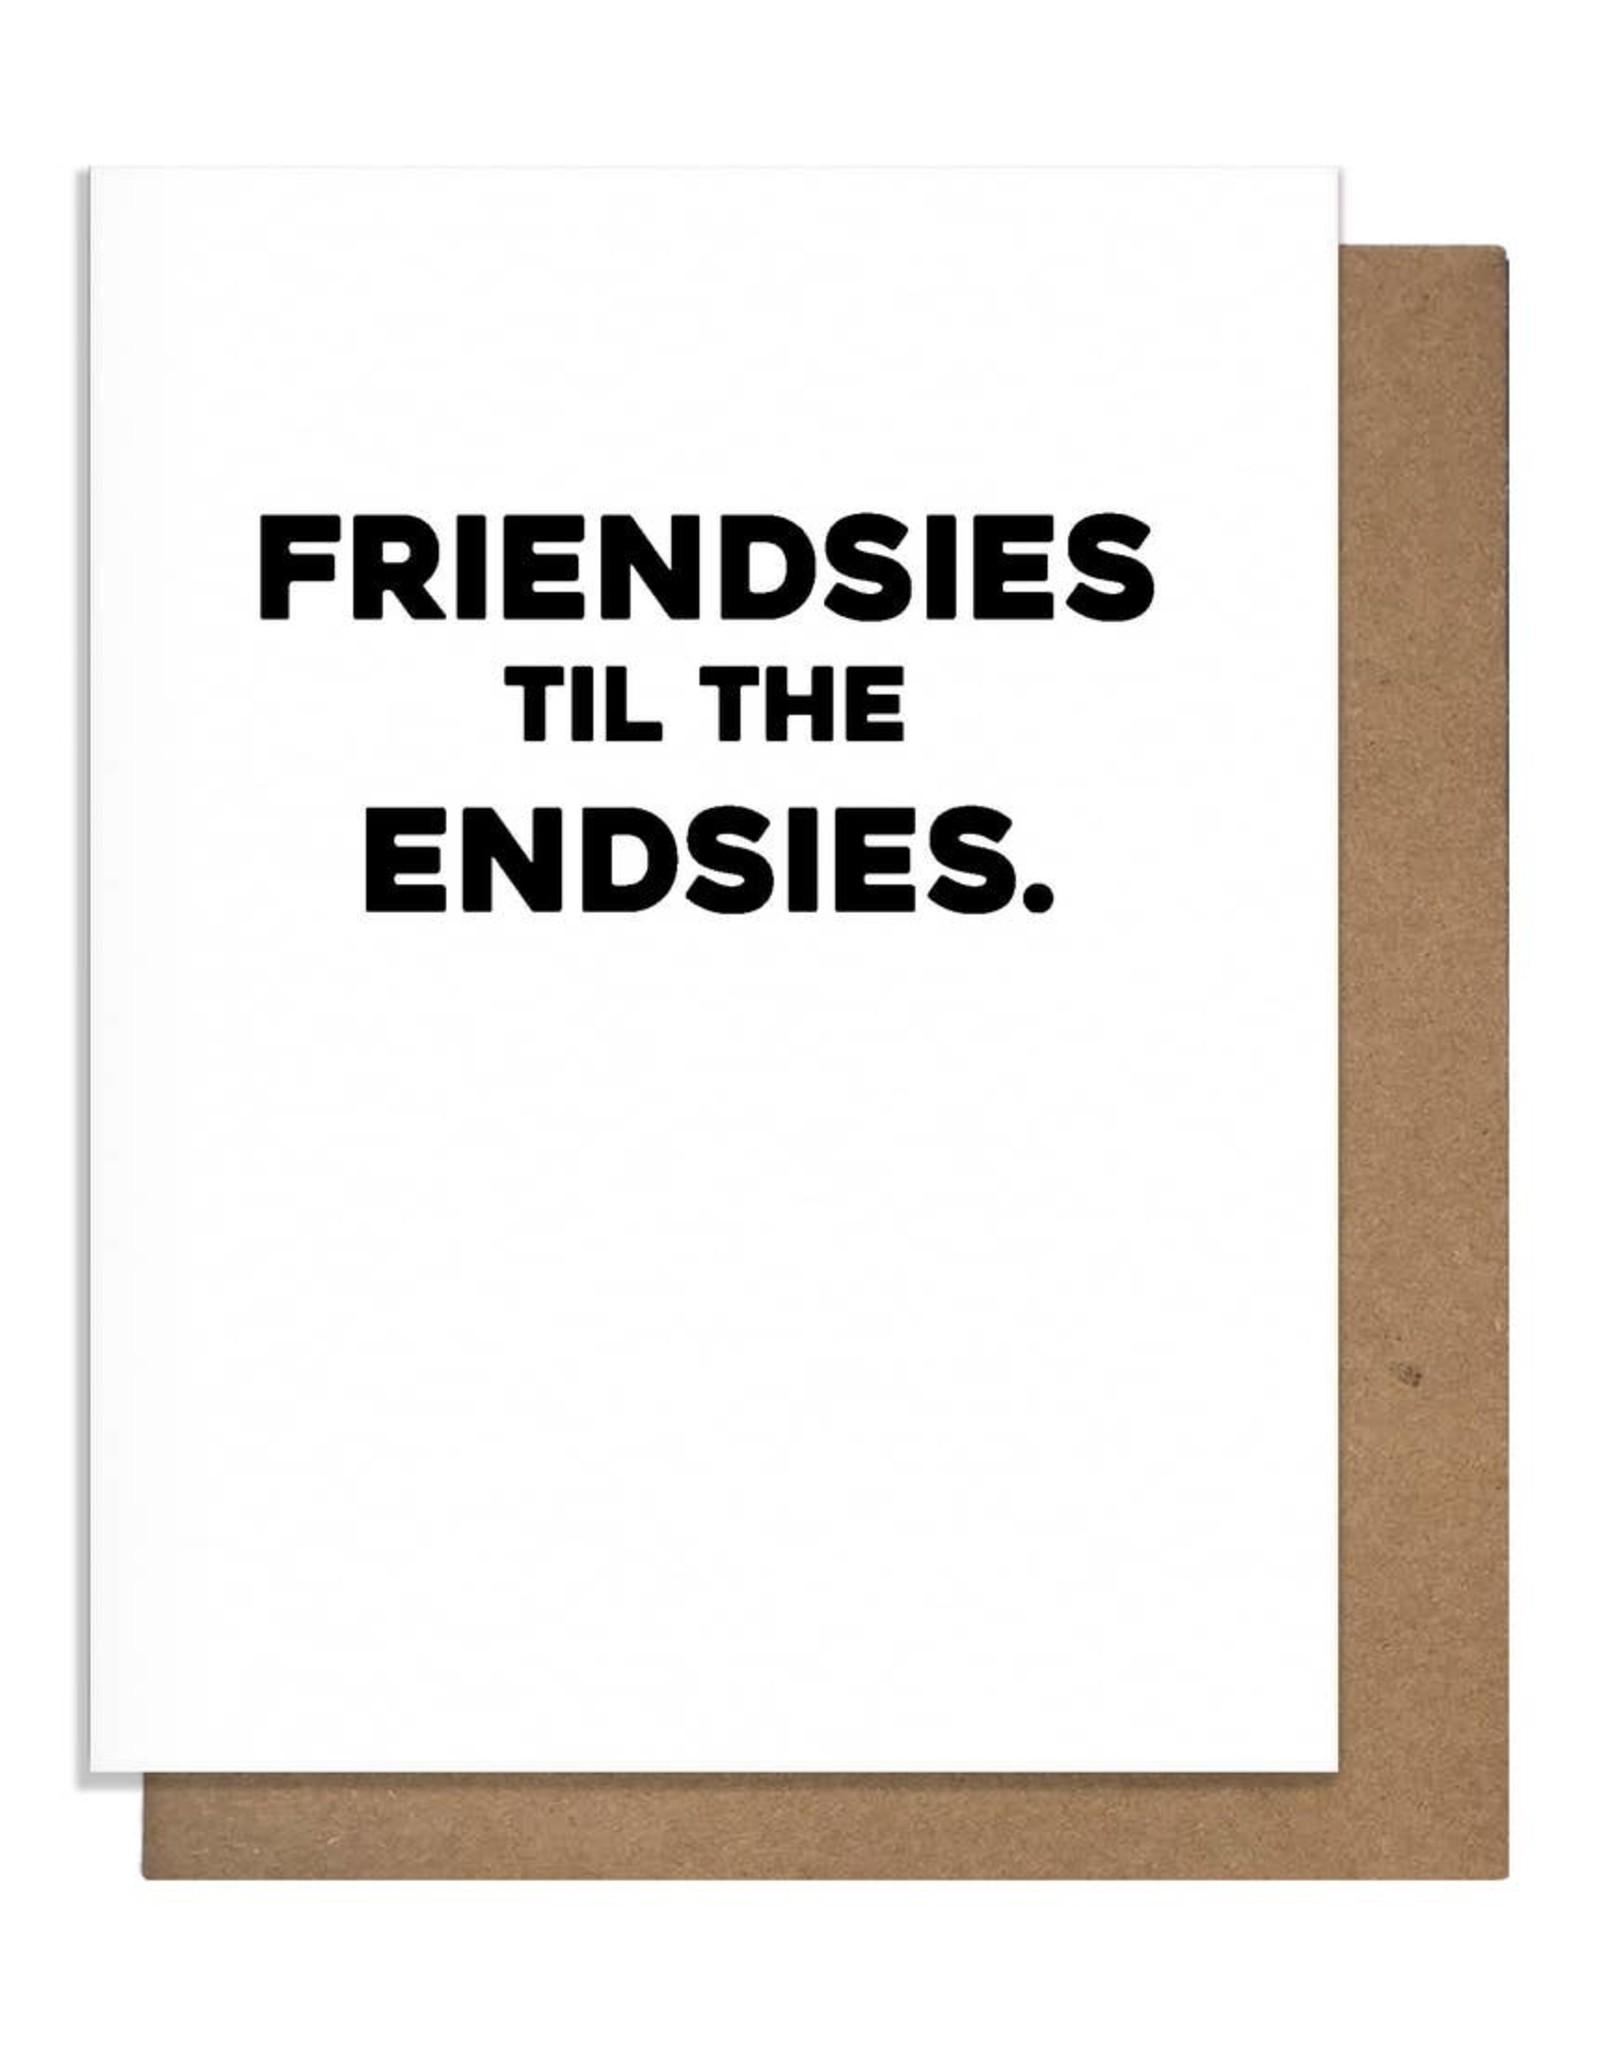 Matt Butler LLC dba Pretty Alright Goods Card - Blank: Friendsies Til The Endsies